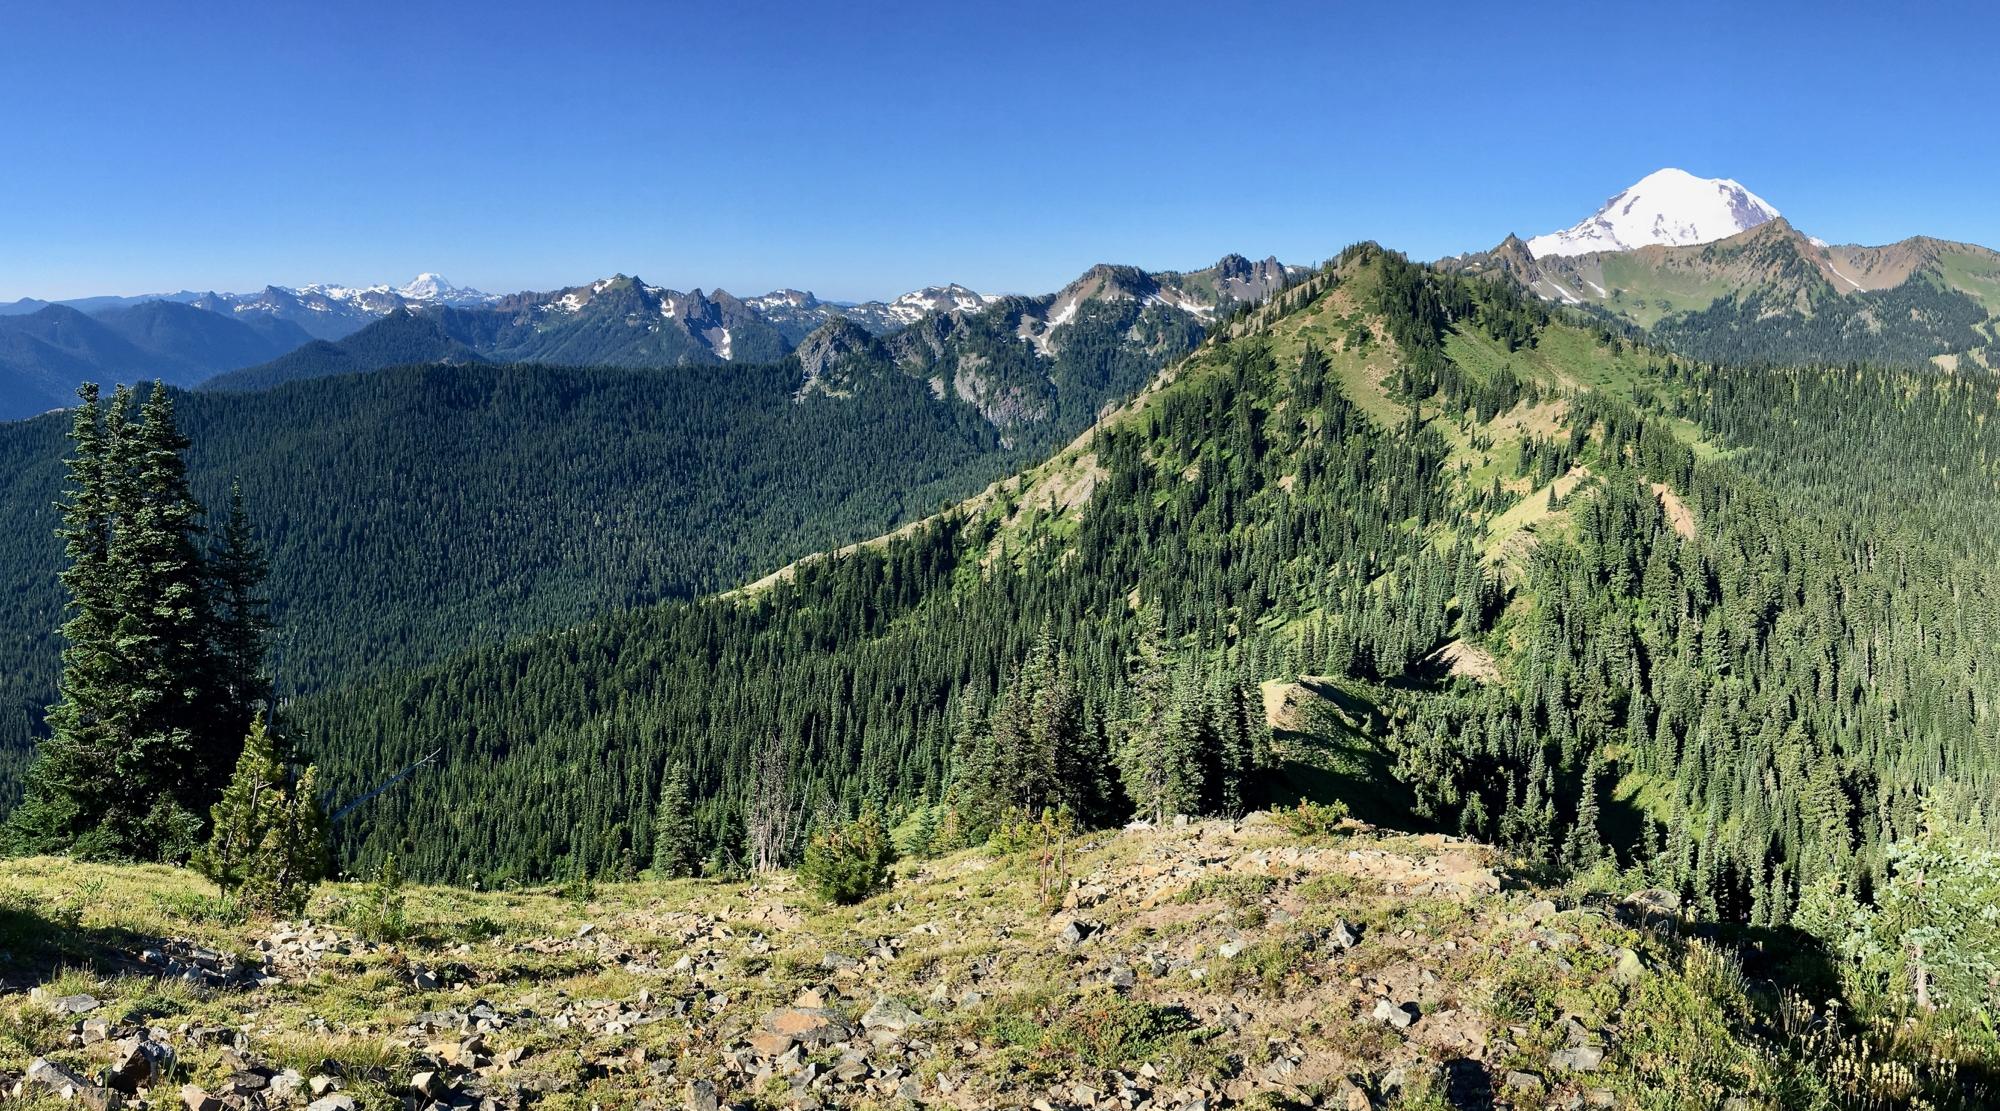 Pacific Crest Trail Section Profile: Washington - The Trek